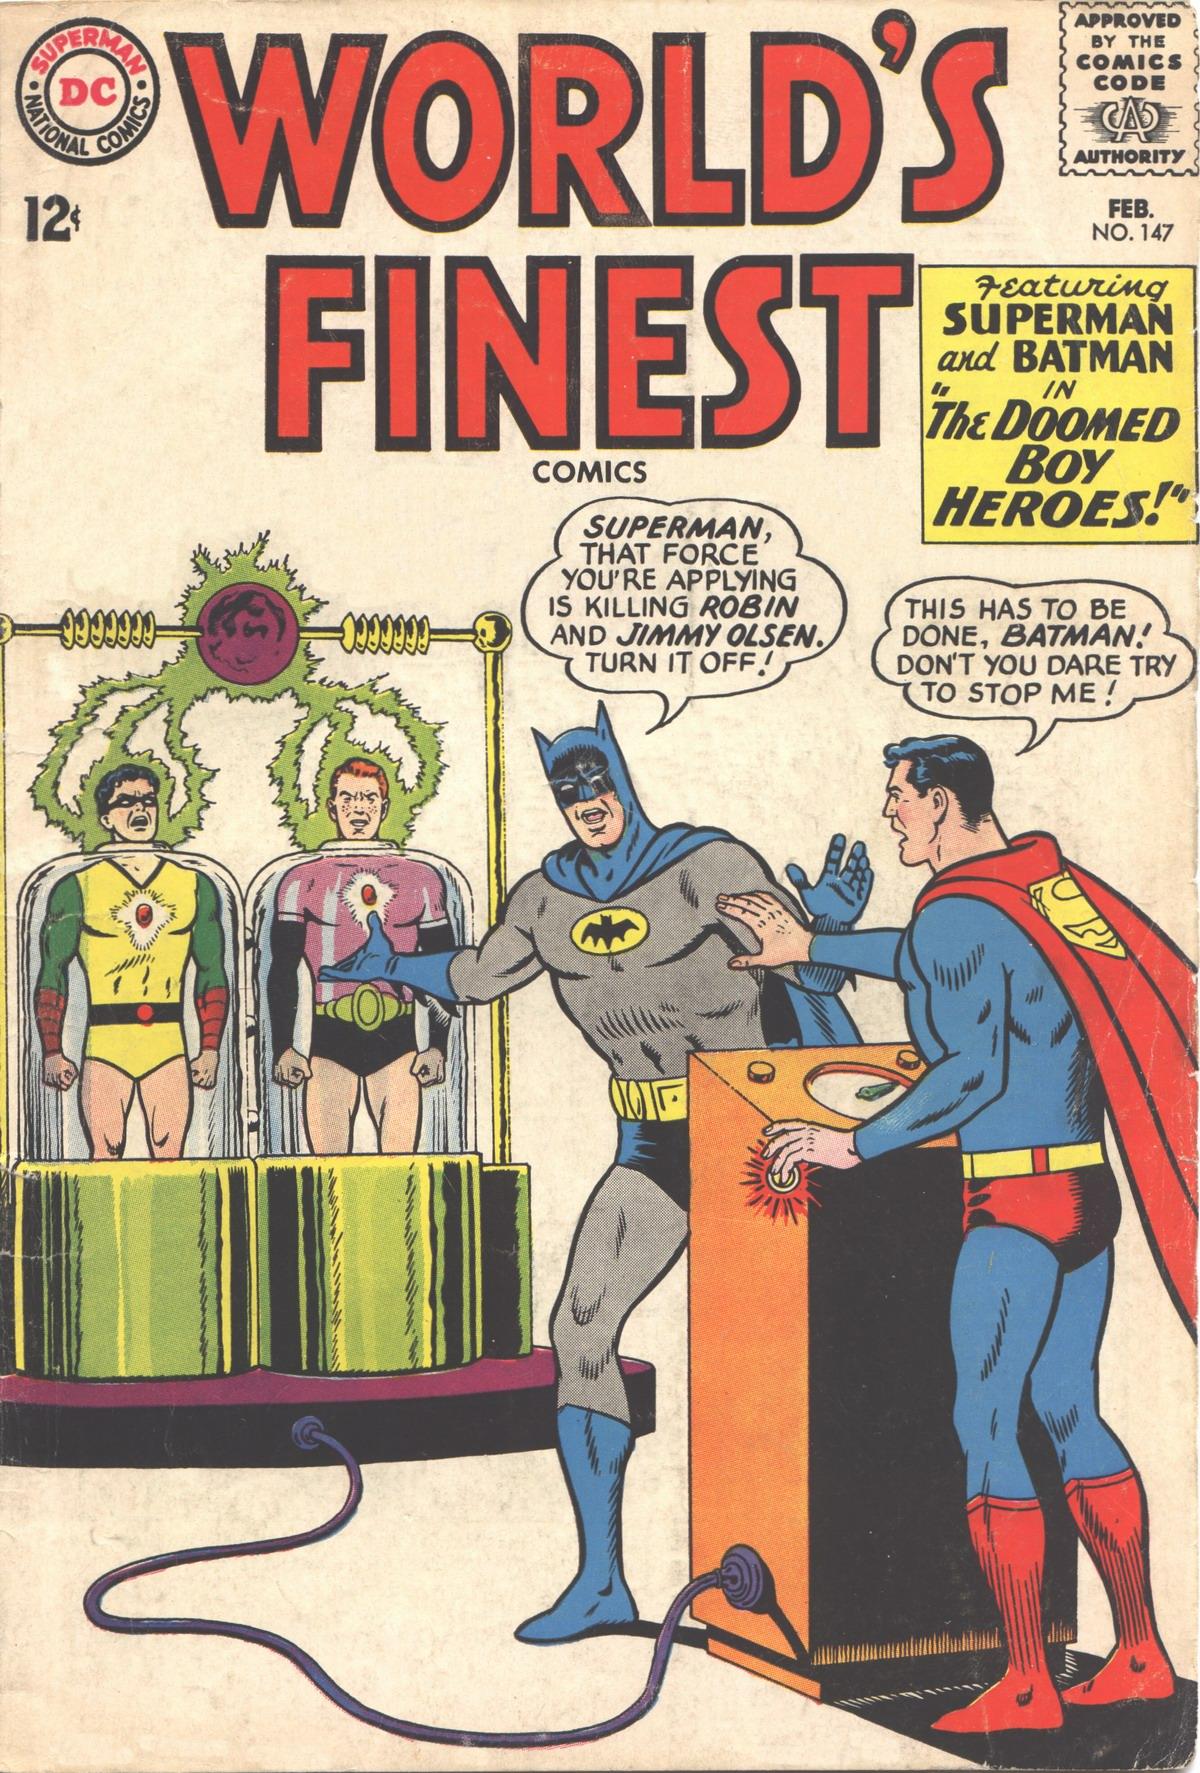 Read online World's Finest Comics comic -  Issue #147 - 1